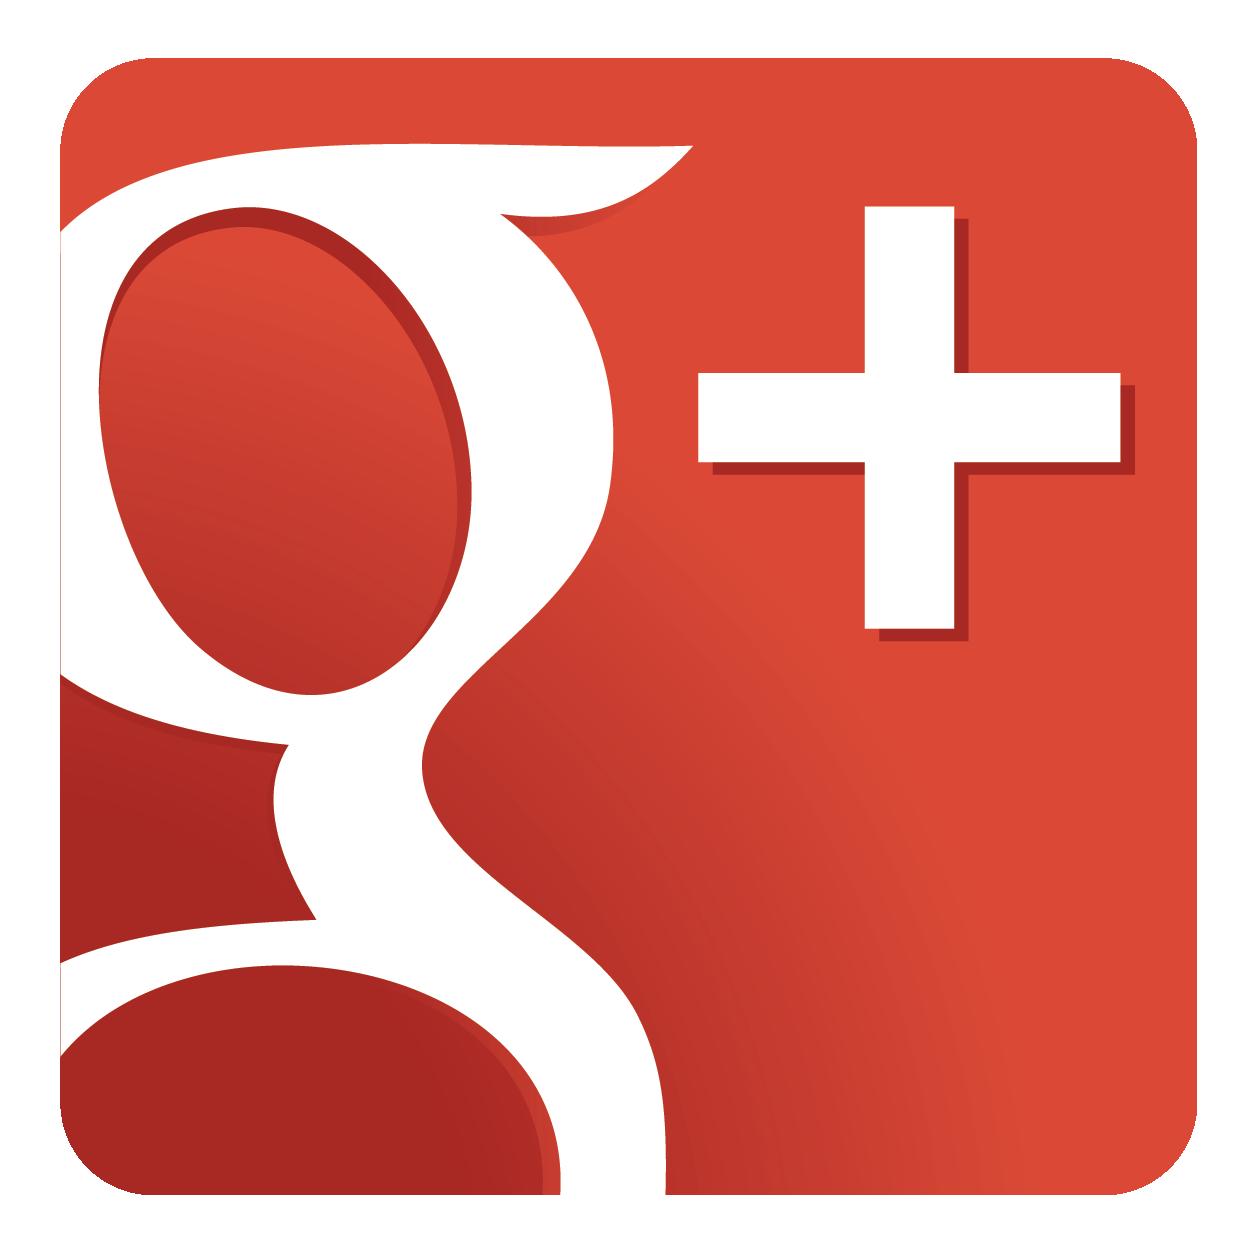 Google Plus Logo Vector